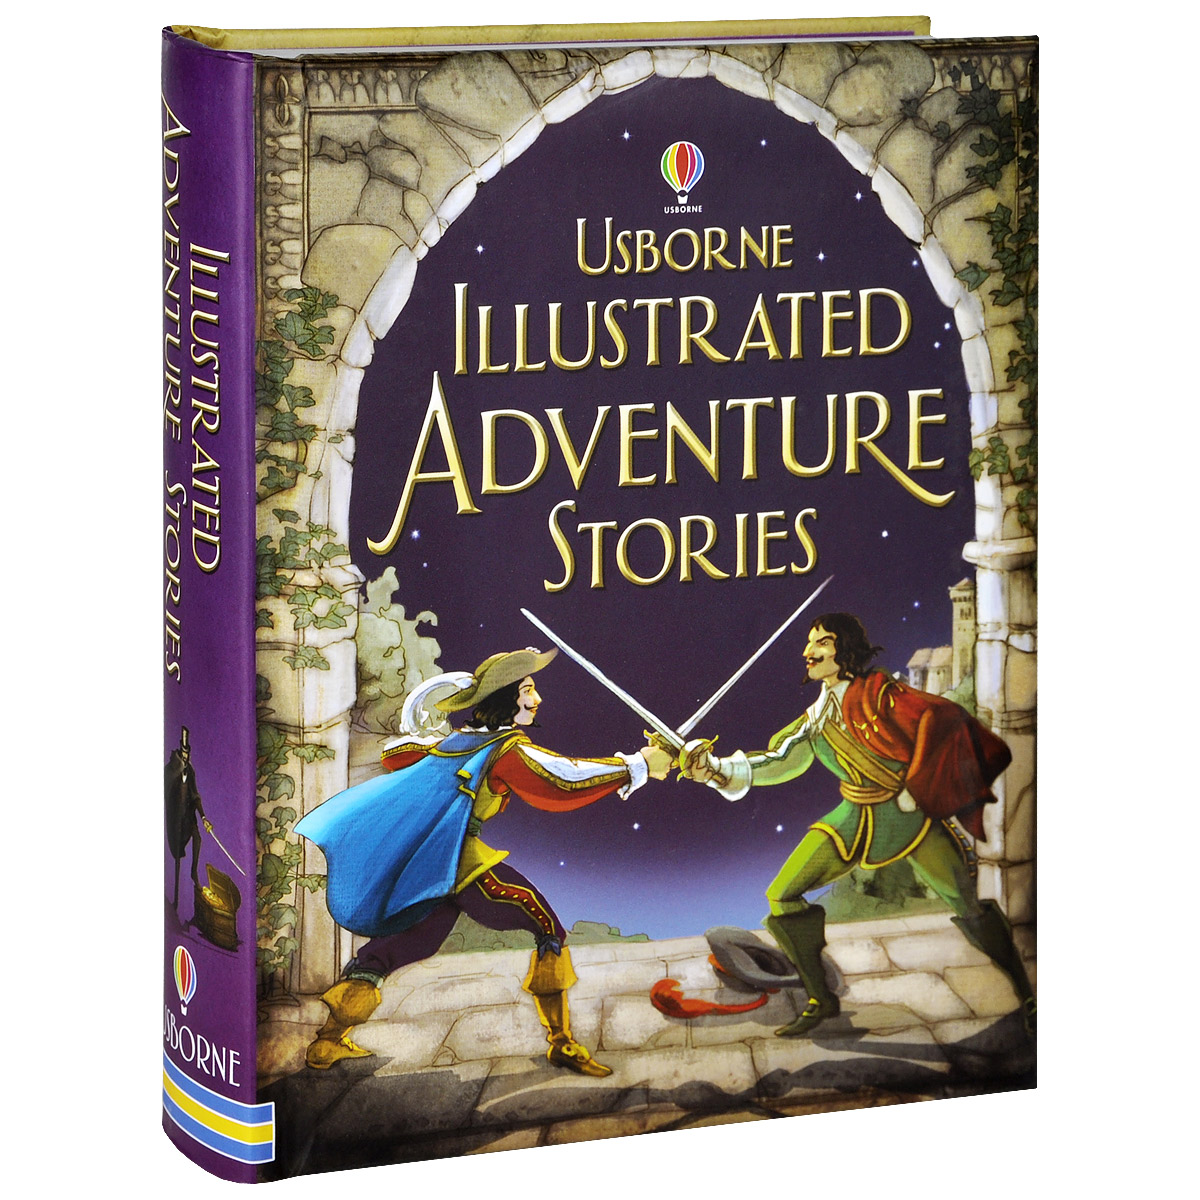 Illustrated Adventure Stories the prisoner of zenda